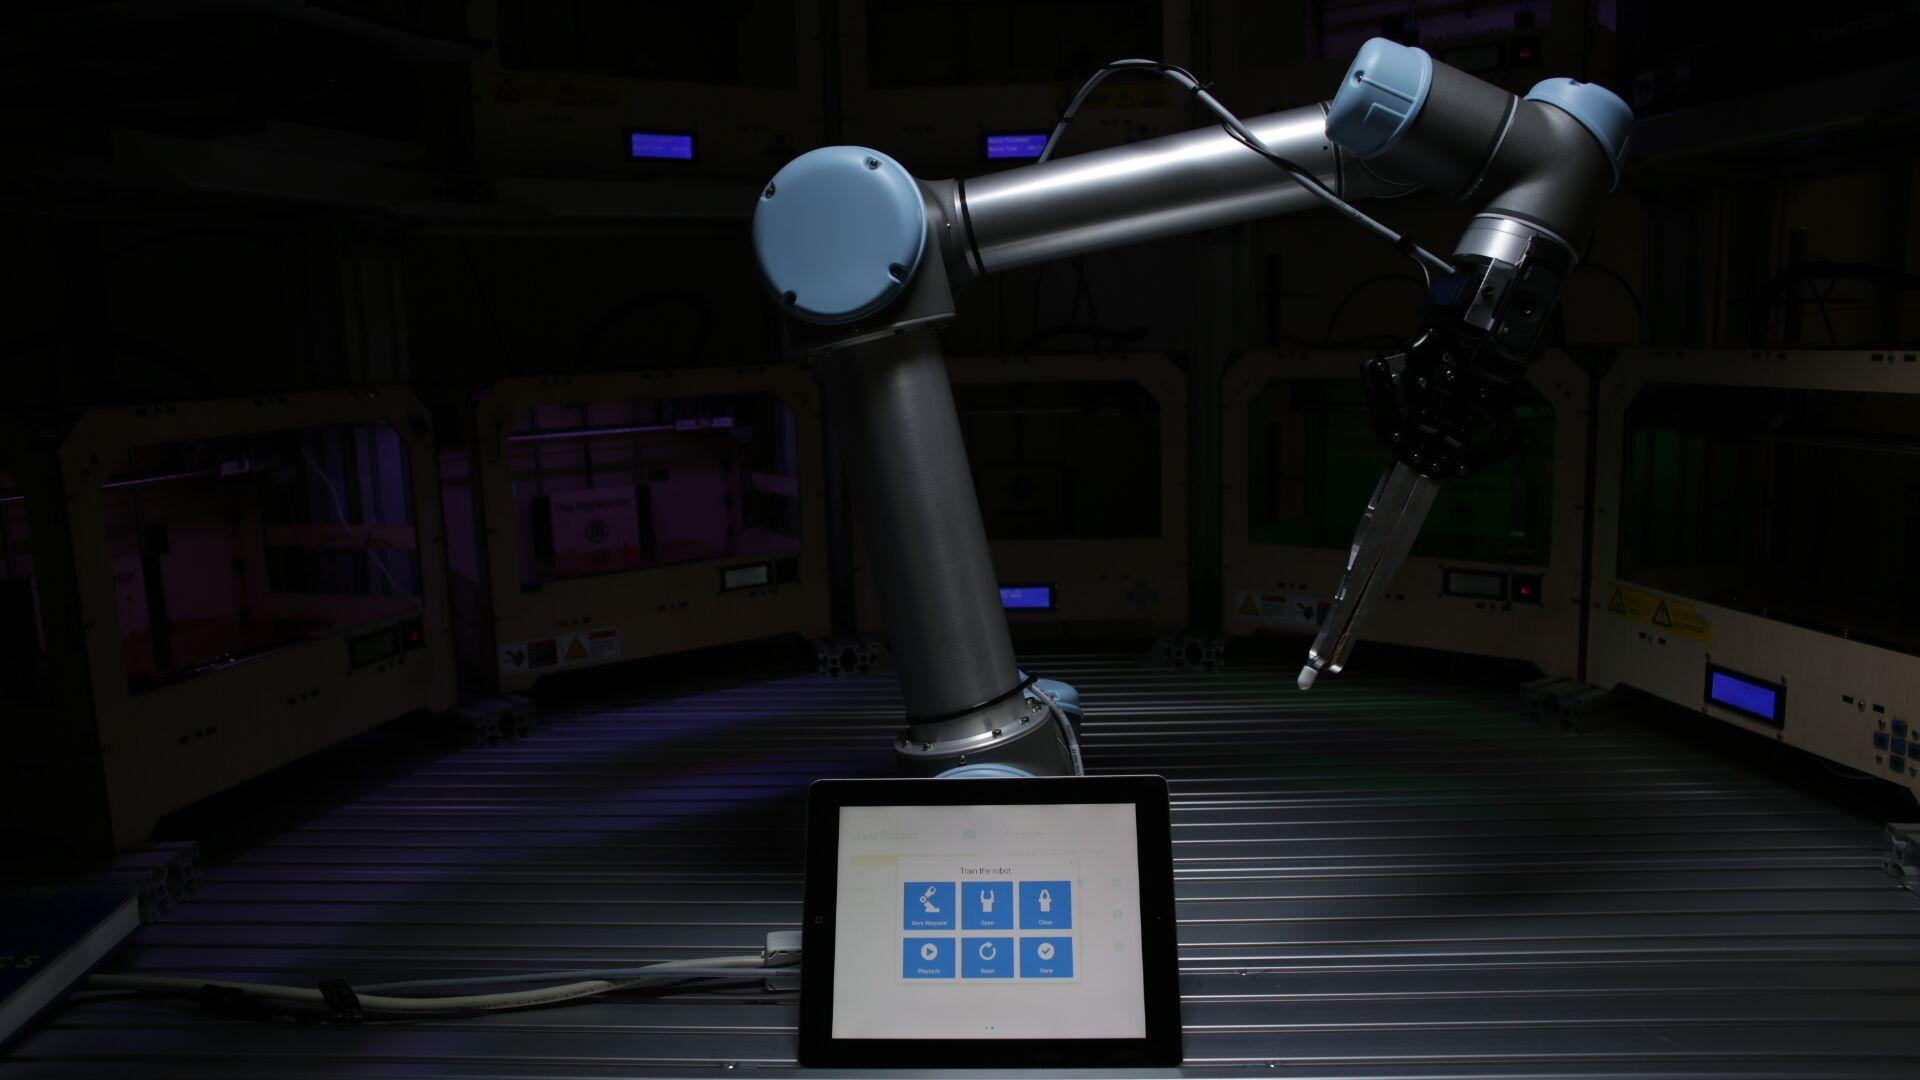 robot_and_ipad